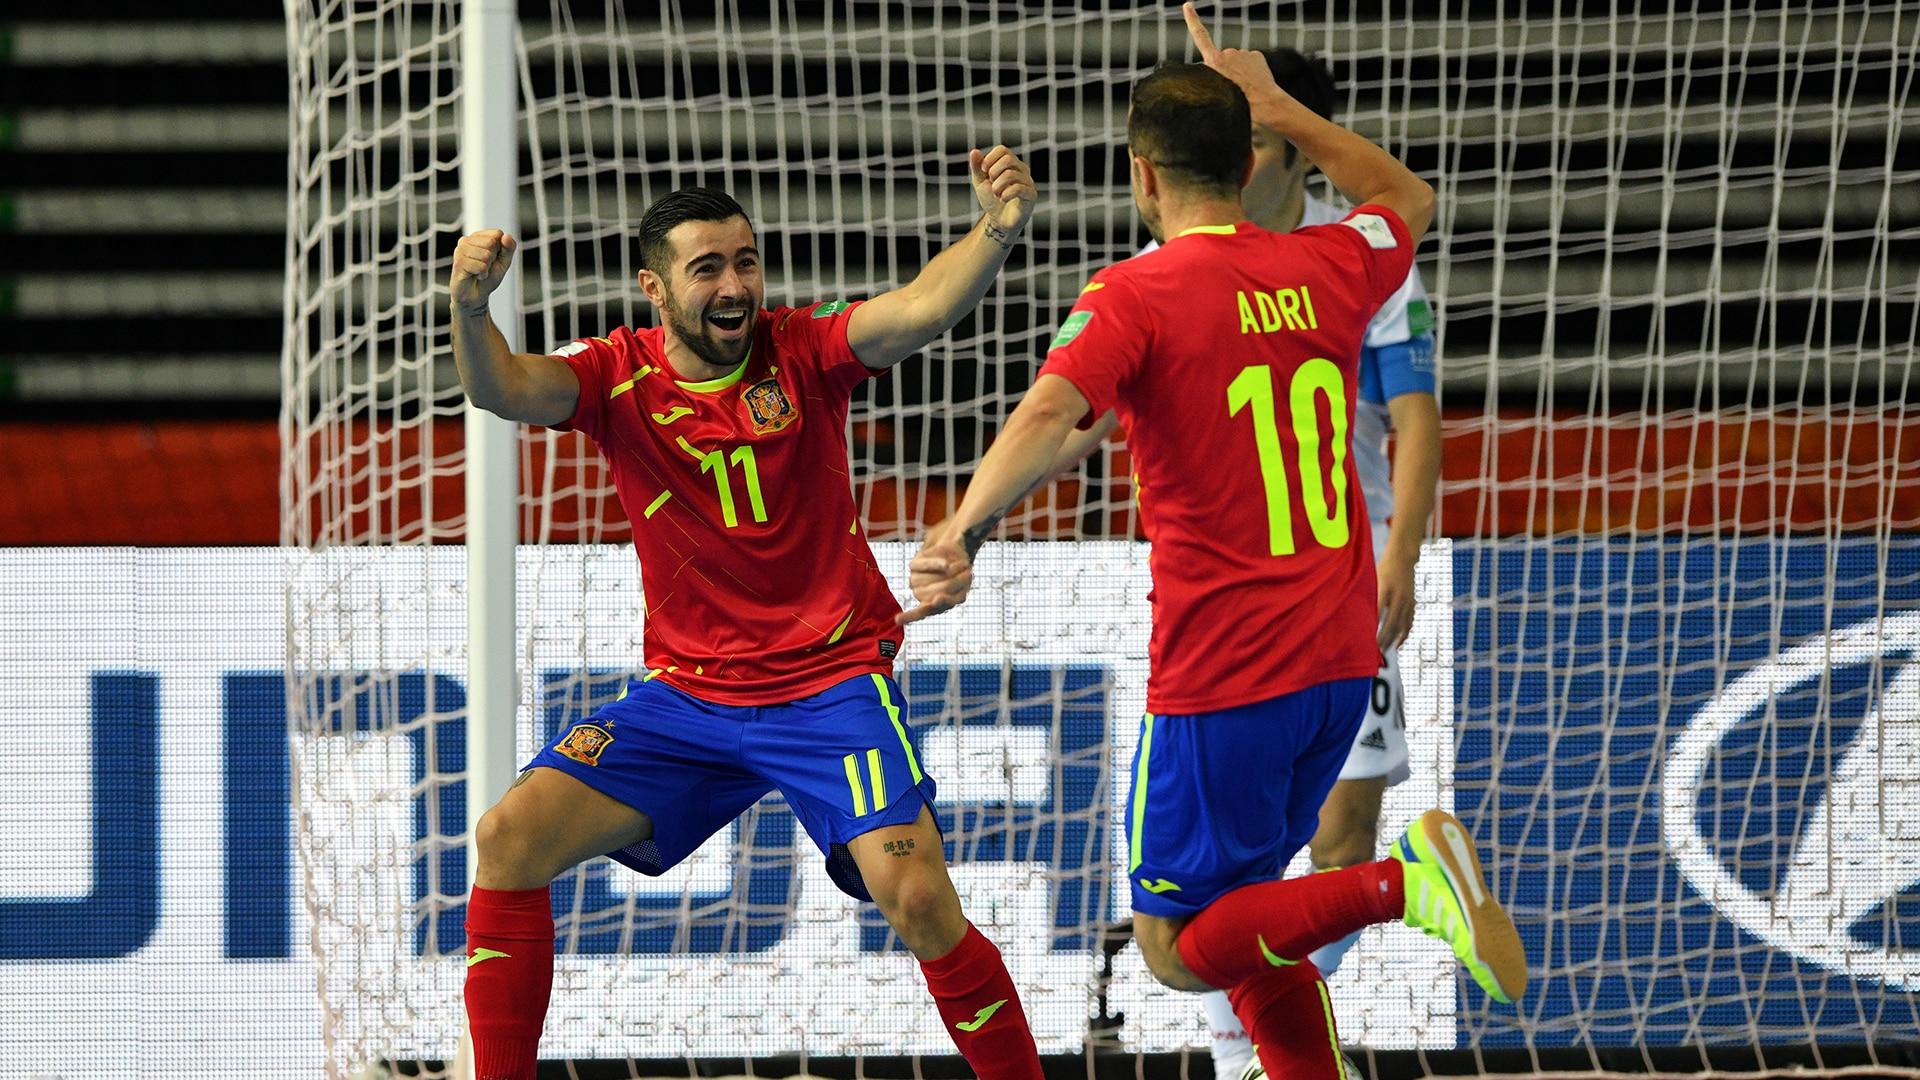 Watch FIFA Futsal World Cup Lithuania 2021 Highlight: España vs. Japón 4-2 - NBC.com